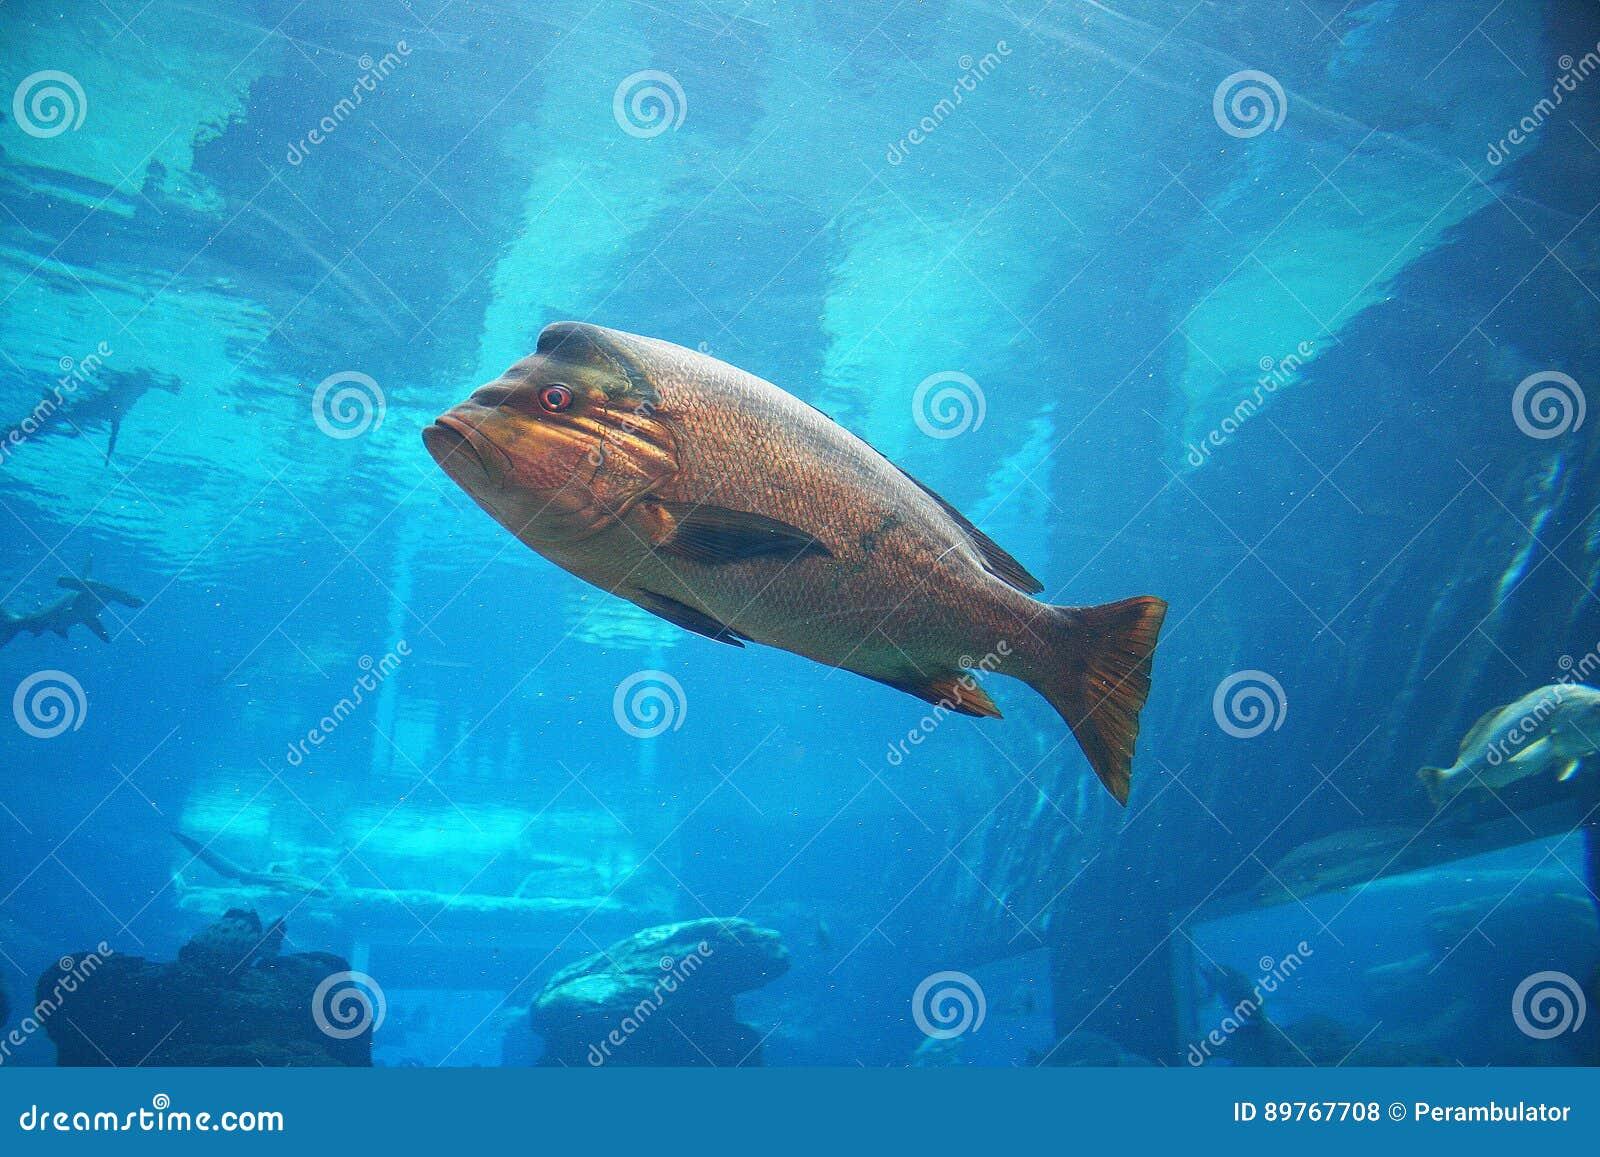 GOLD COLOURED FISH IN AN AQUARIUM